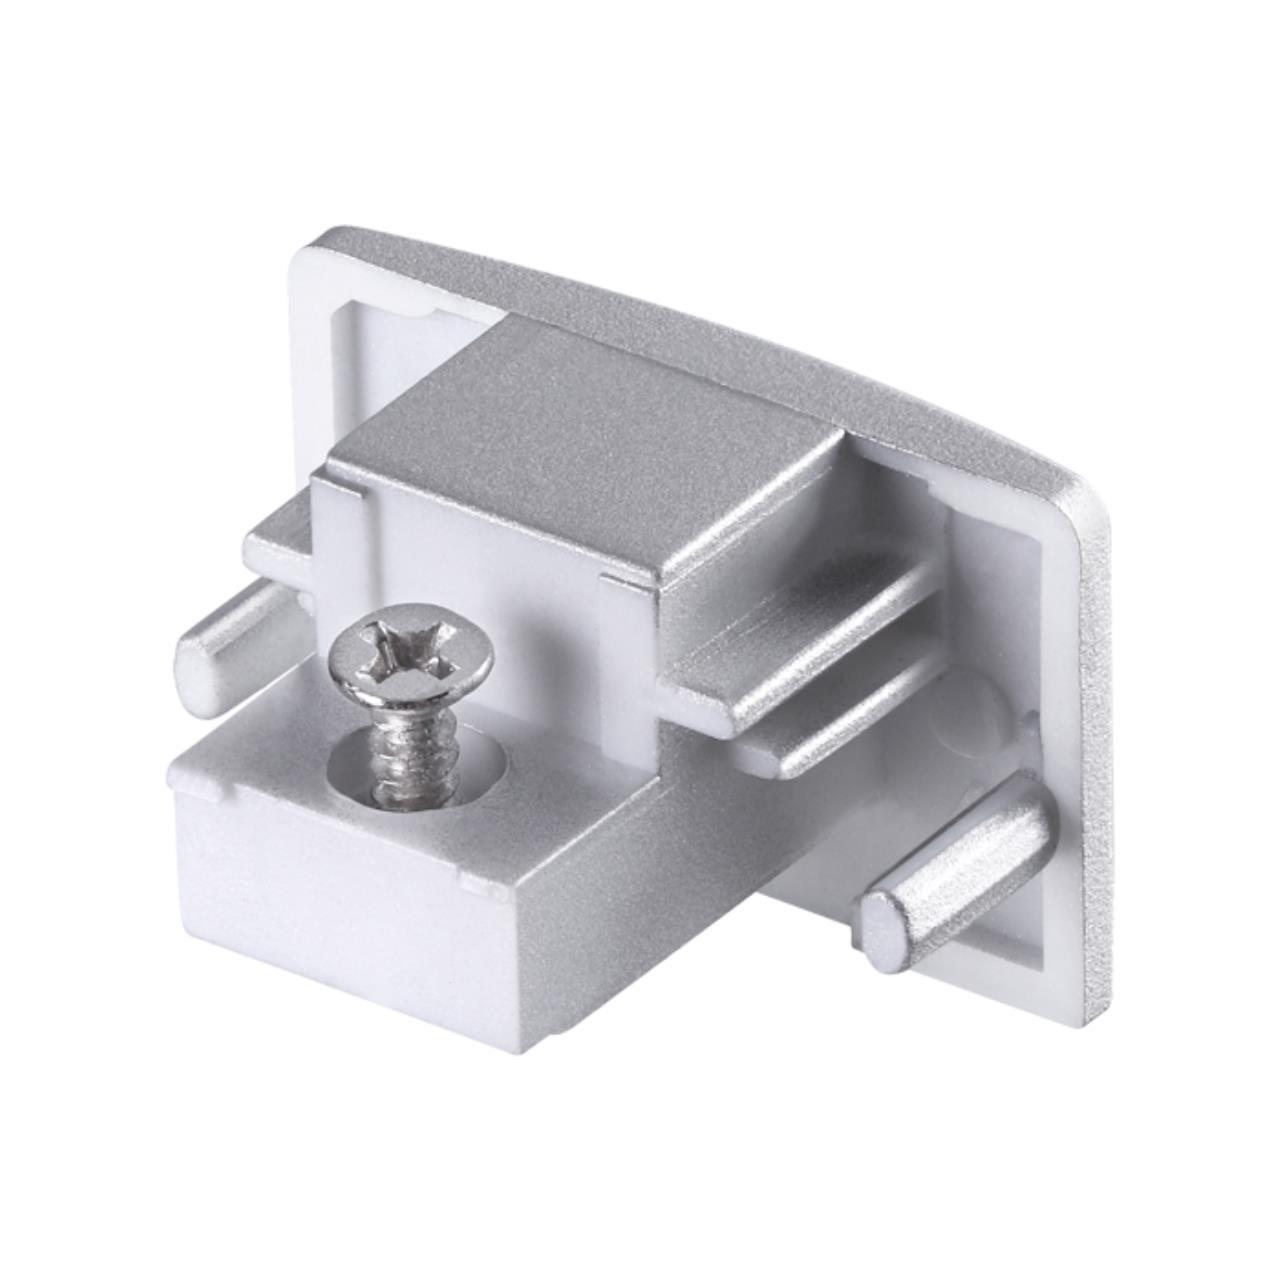 135087 PORT NT19 016 серебро Заглушка торцевая для однофазного шинопровода IP20